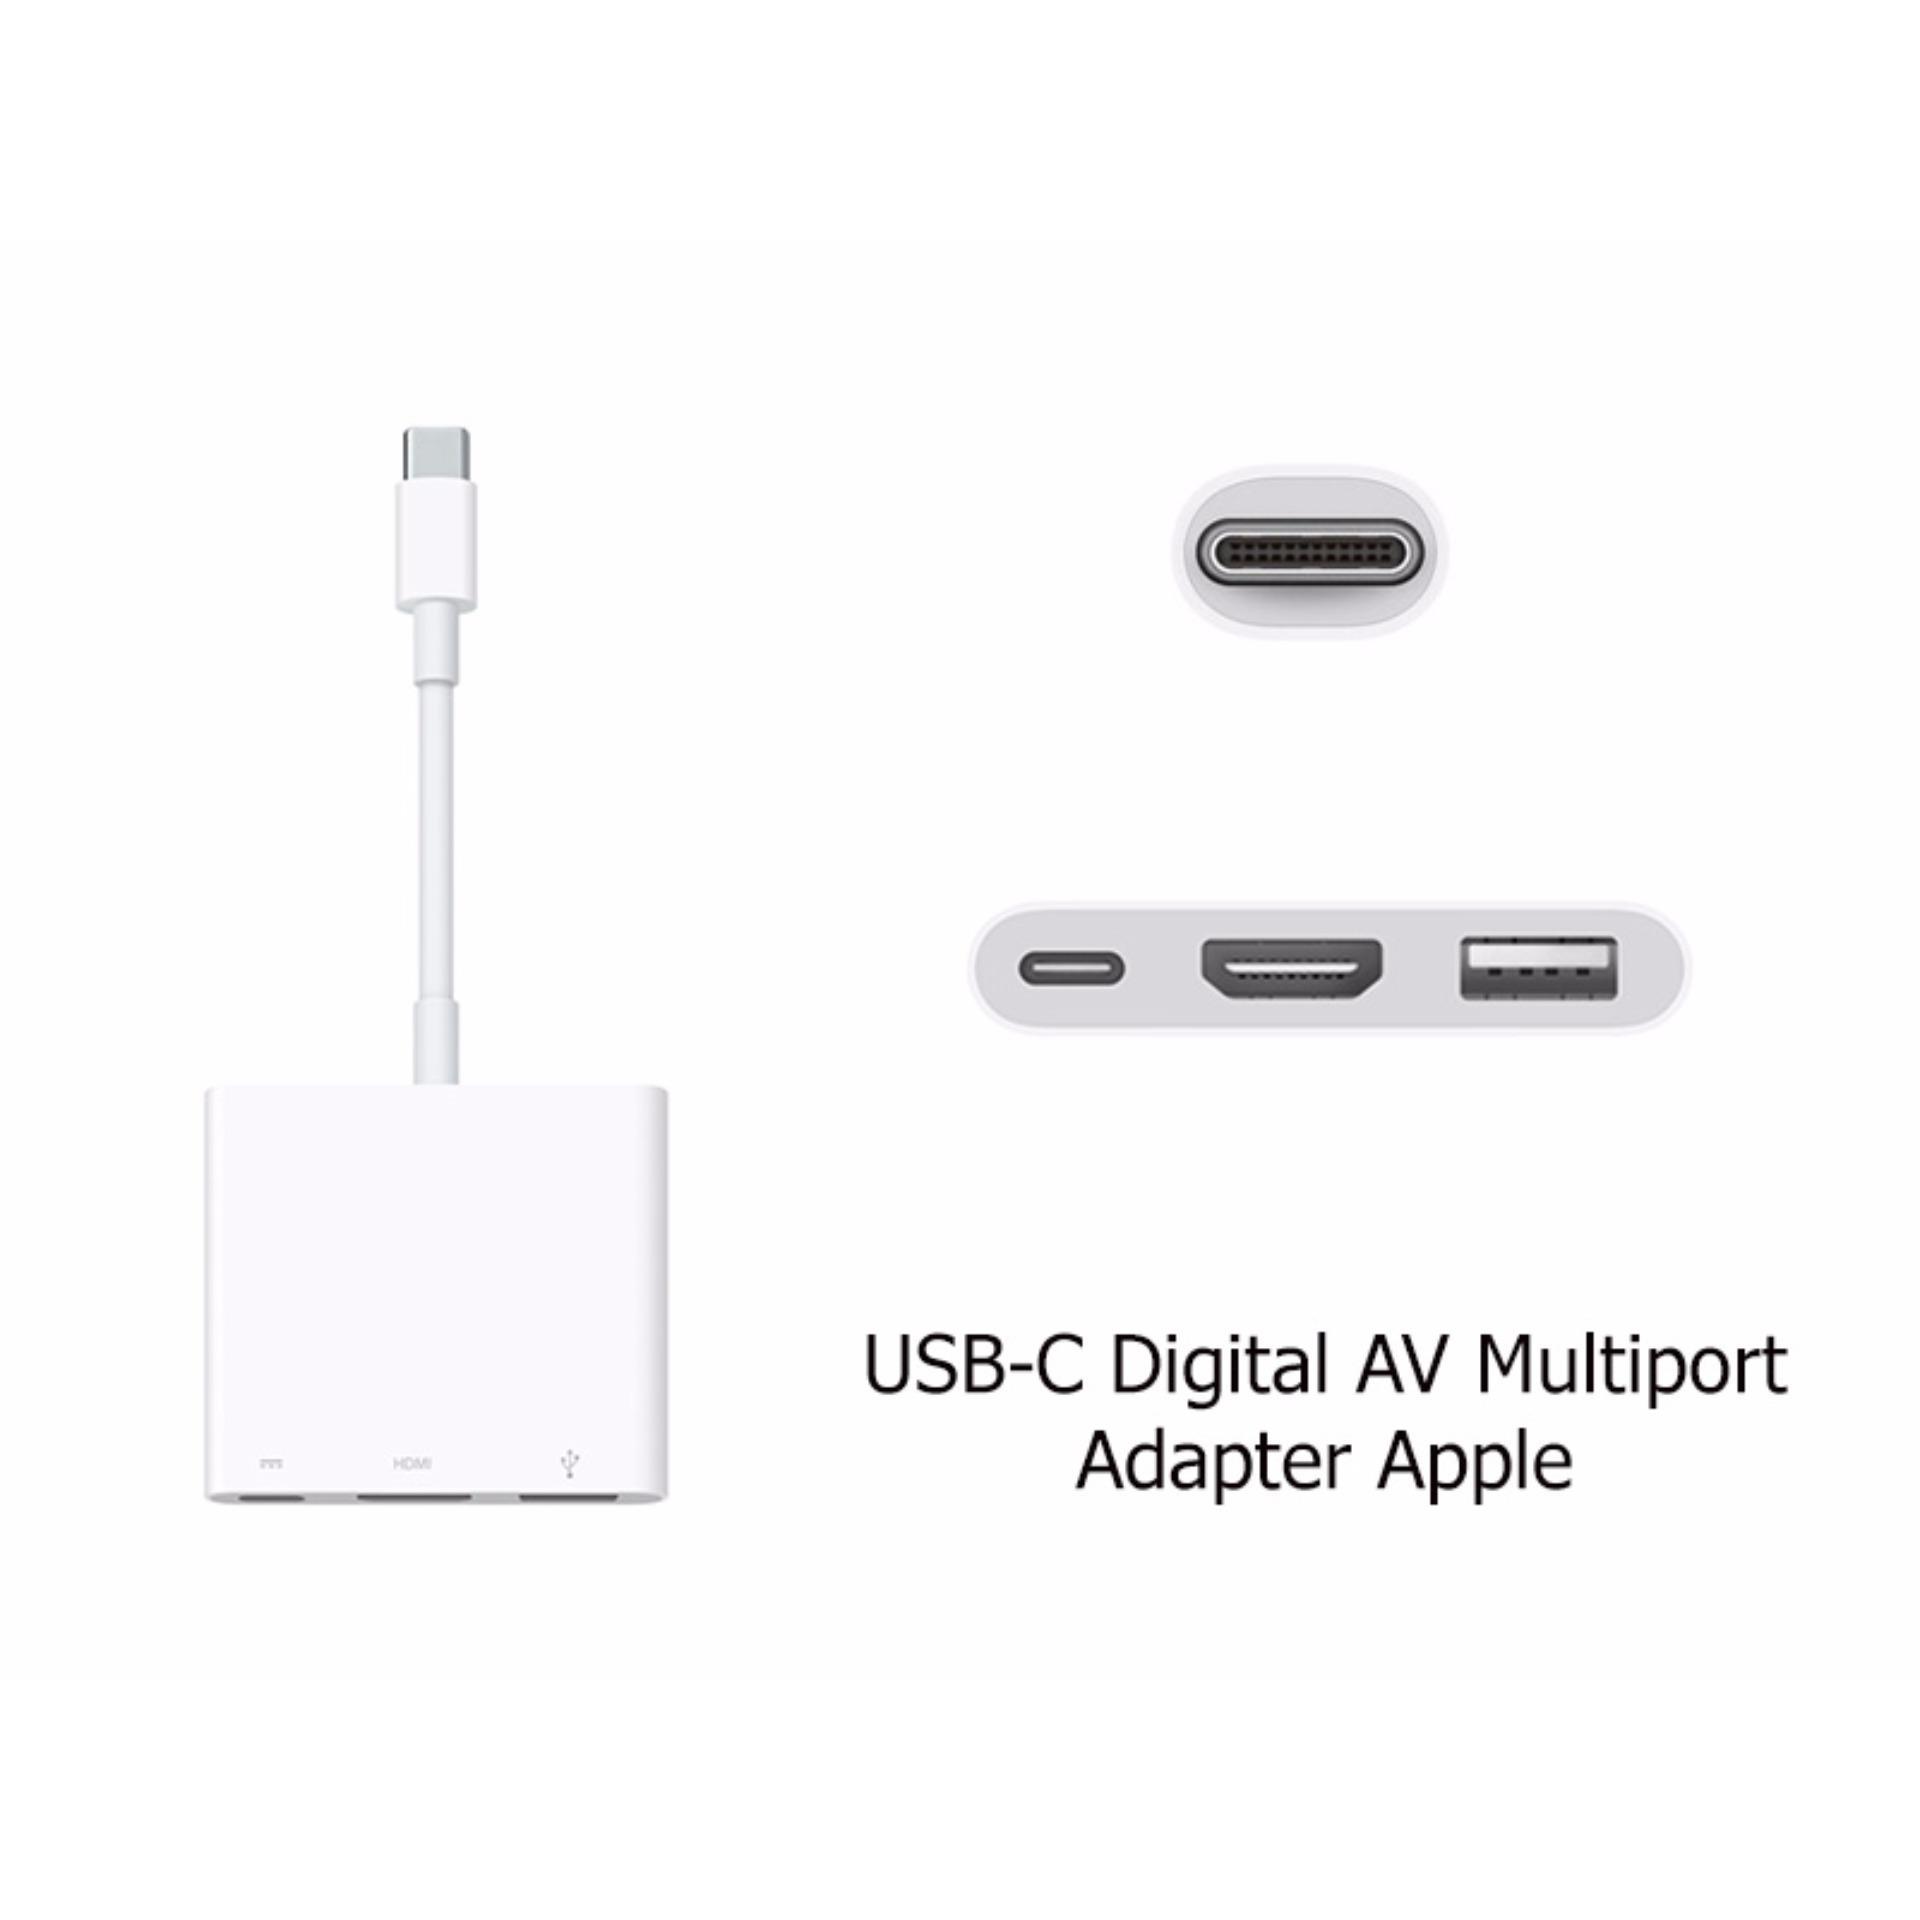 Cáp USB-C Digital AV Multiport Adapter Apple – Nhập khẩu Apple – Phụ Kiện Vàng